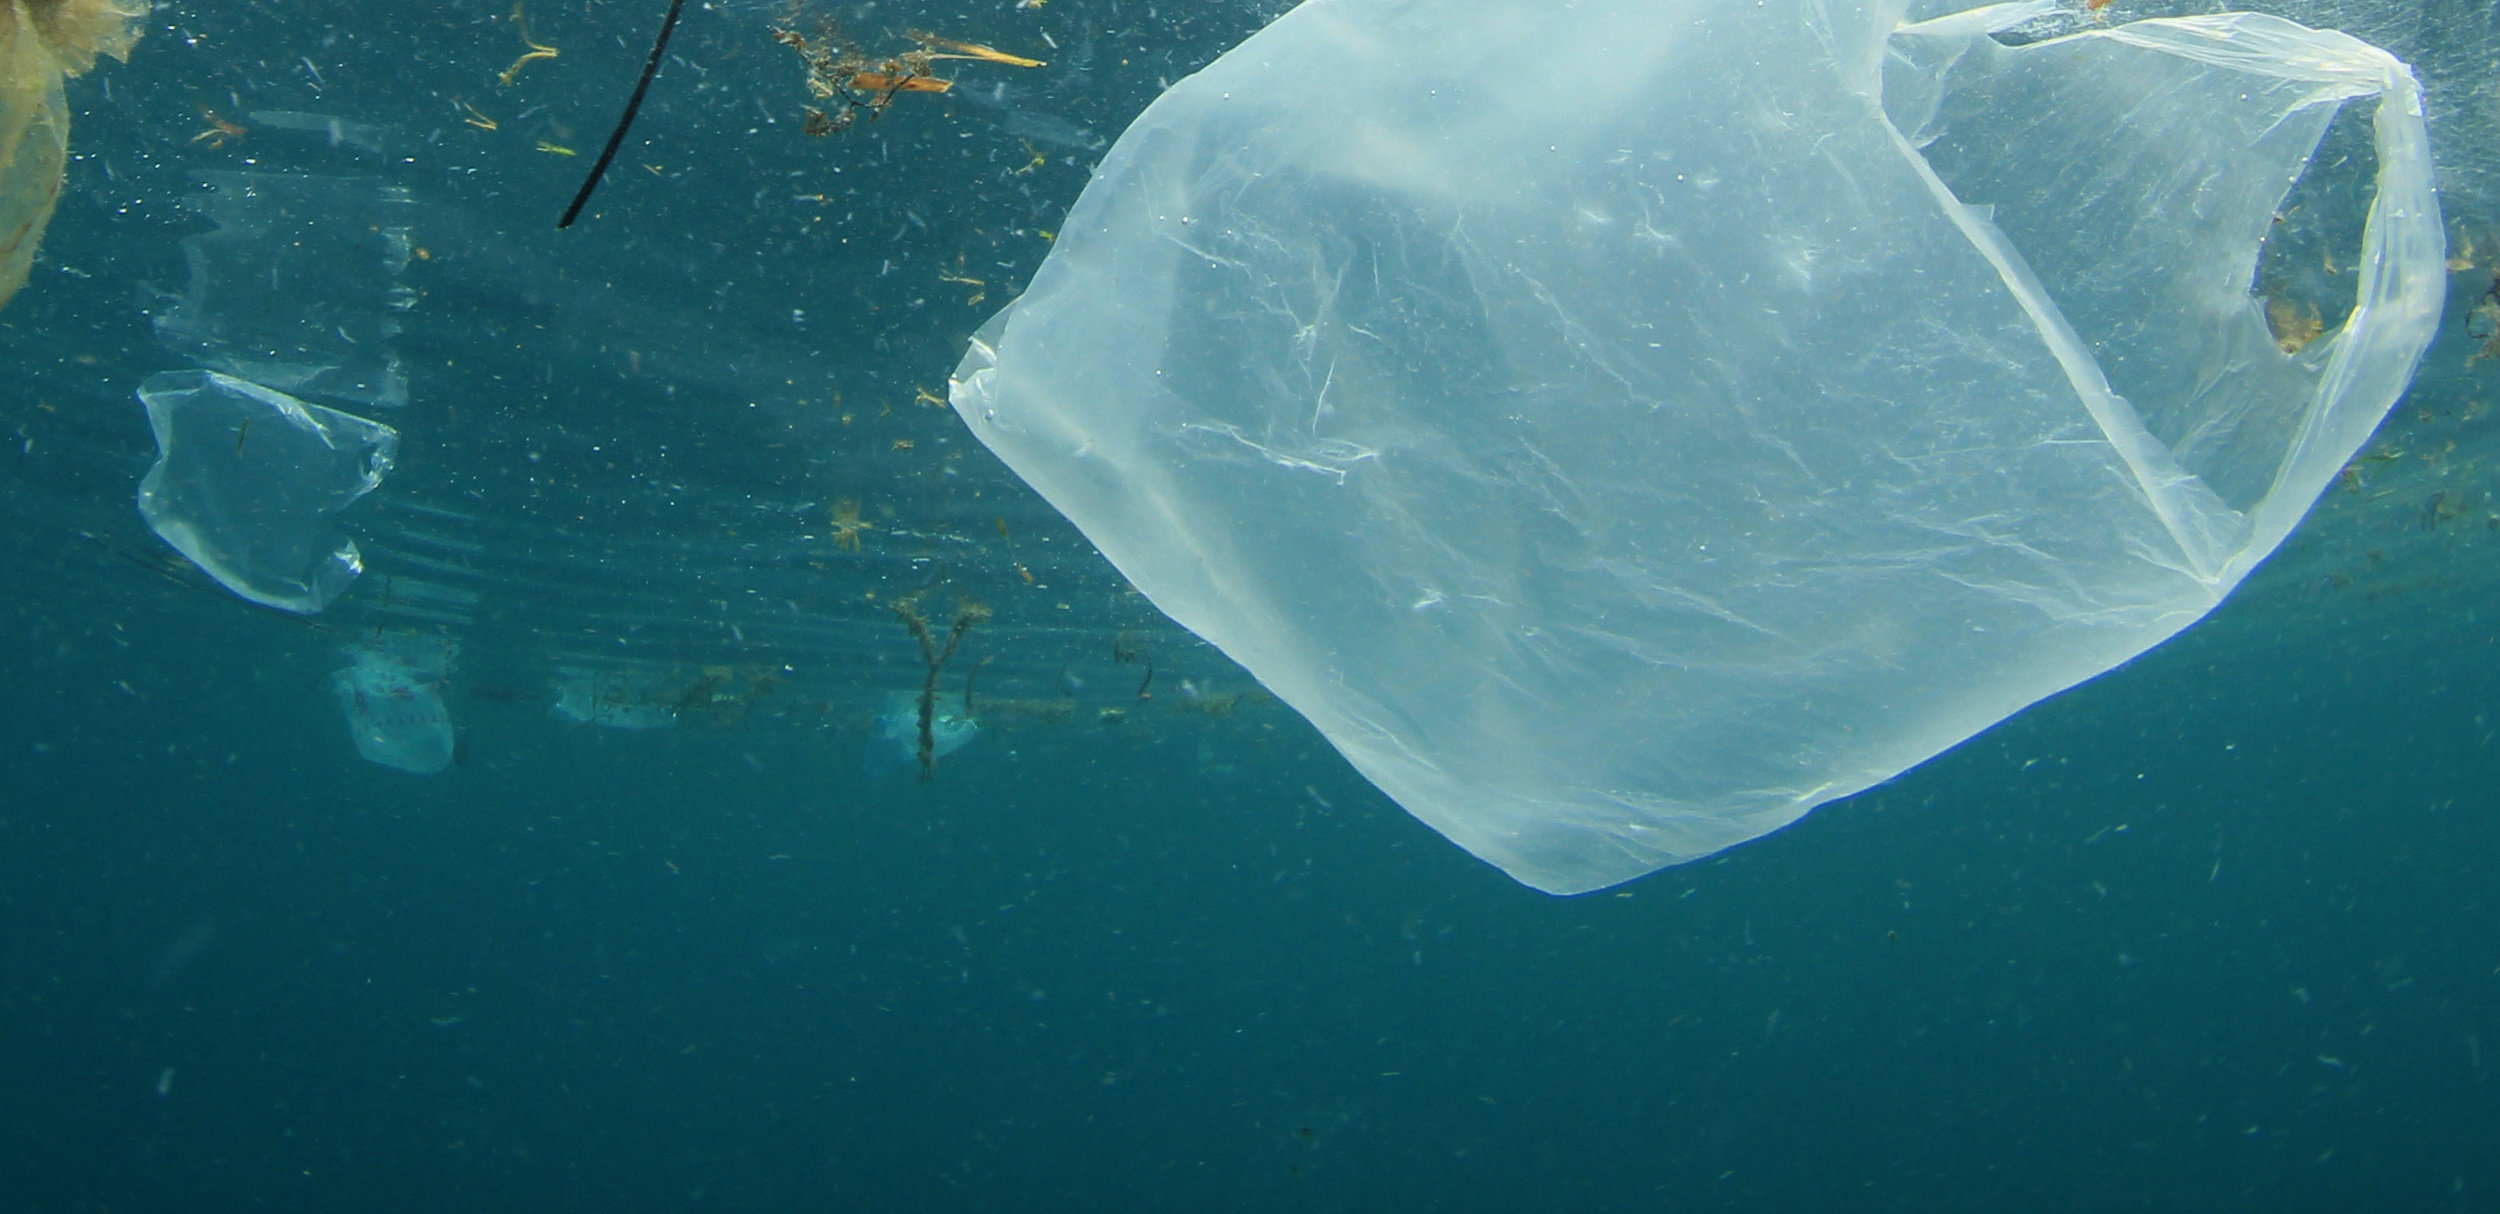 plastic-in-ocean-will-disappear.jpg